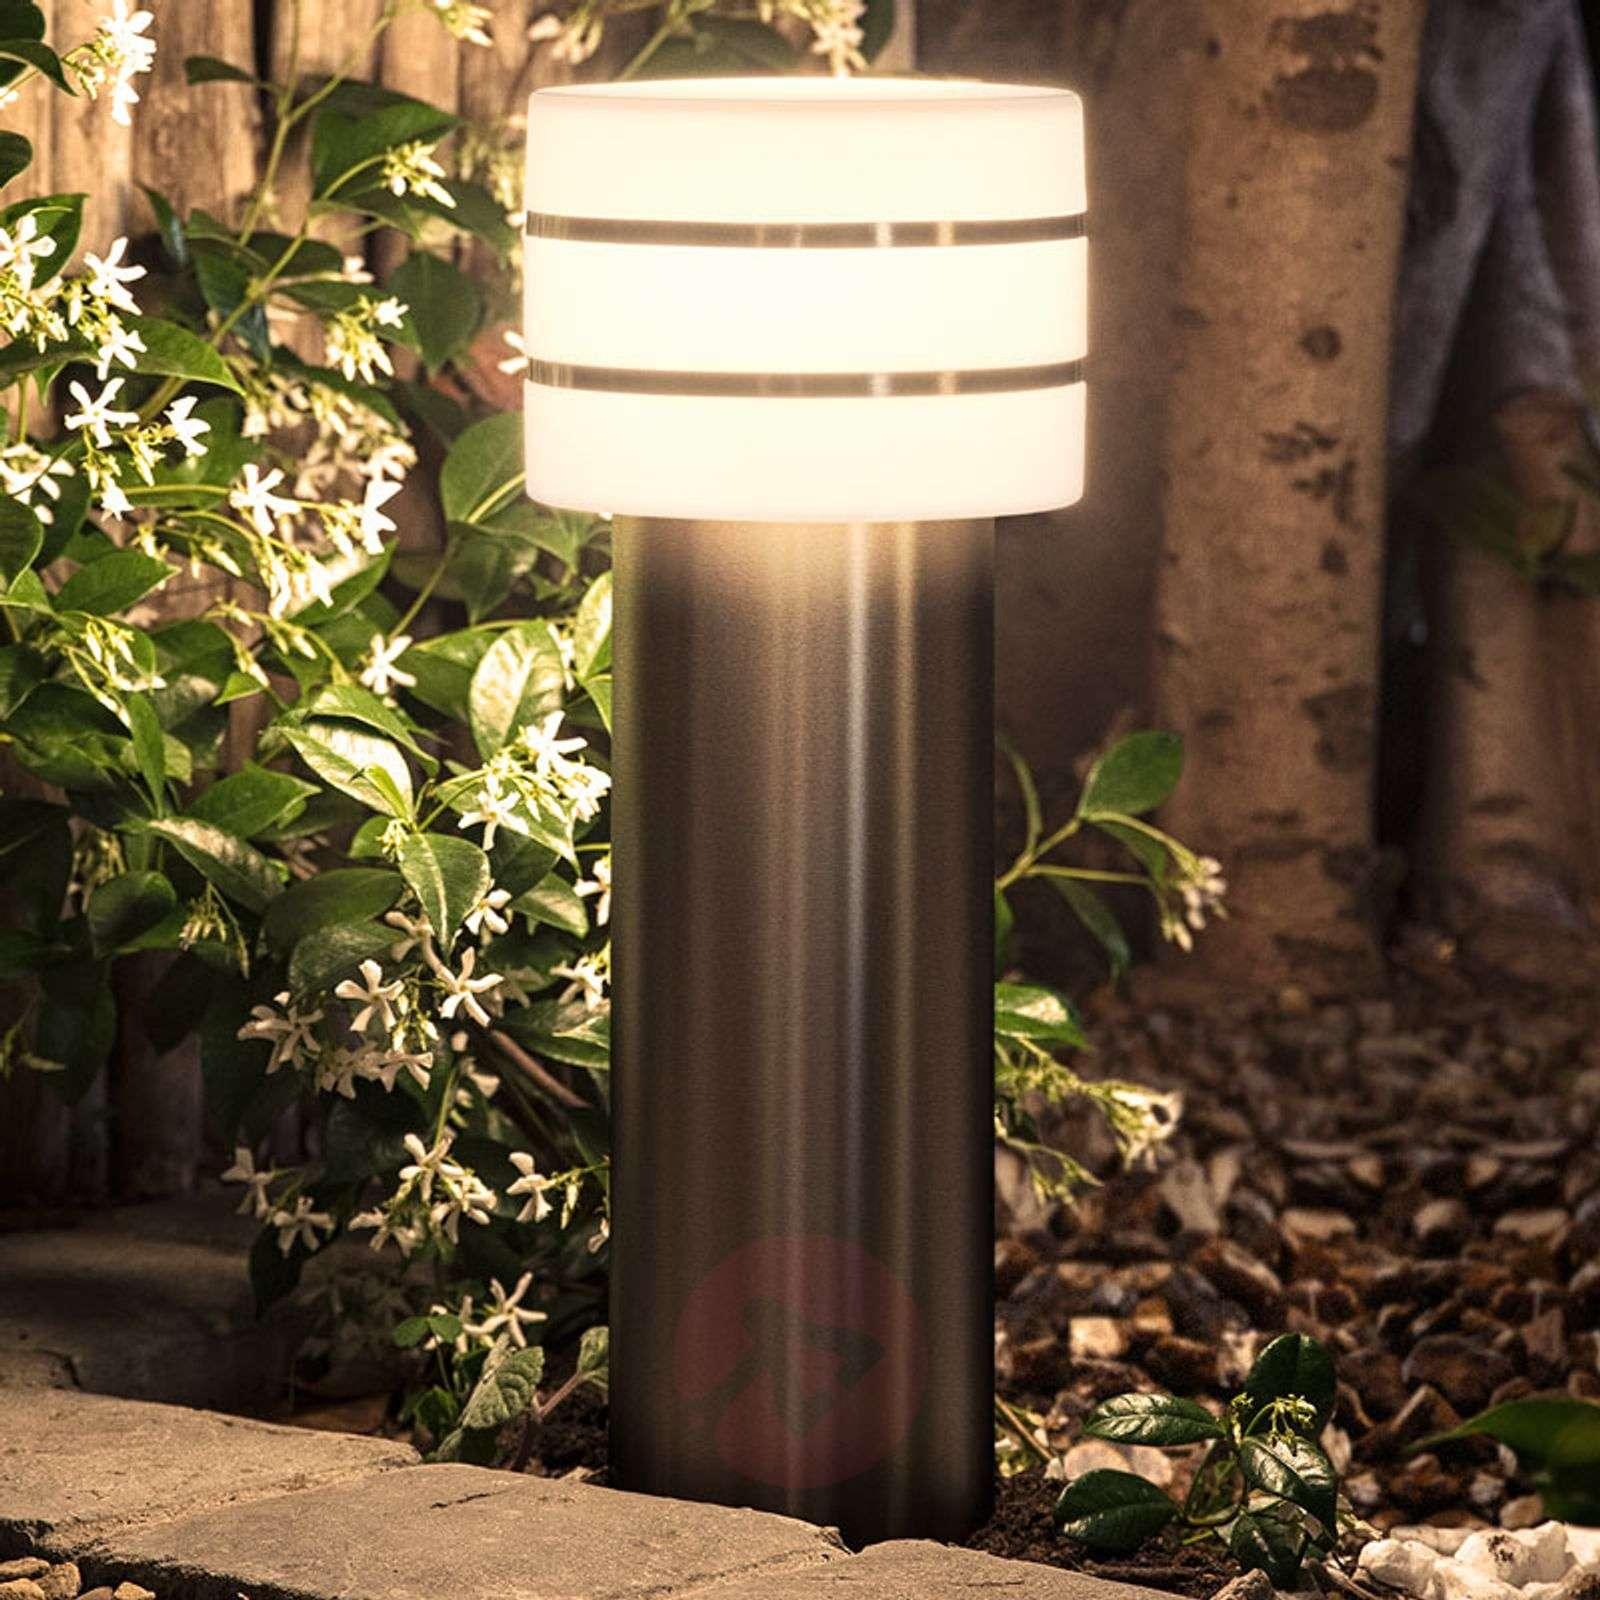 Philips Hue Tuar LED pillar lamp, dimmable via app-7534052-01